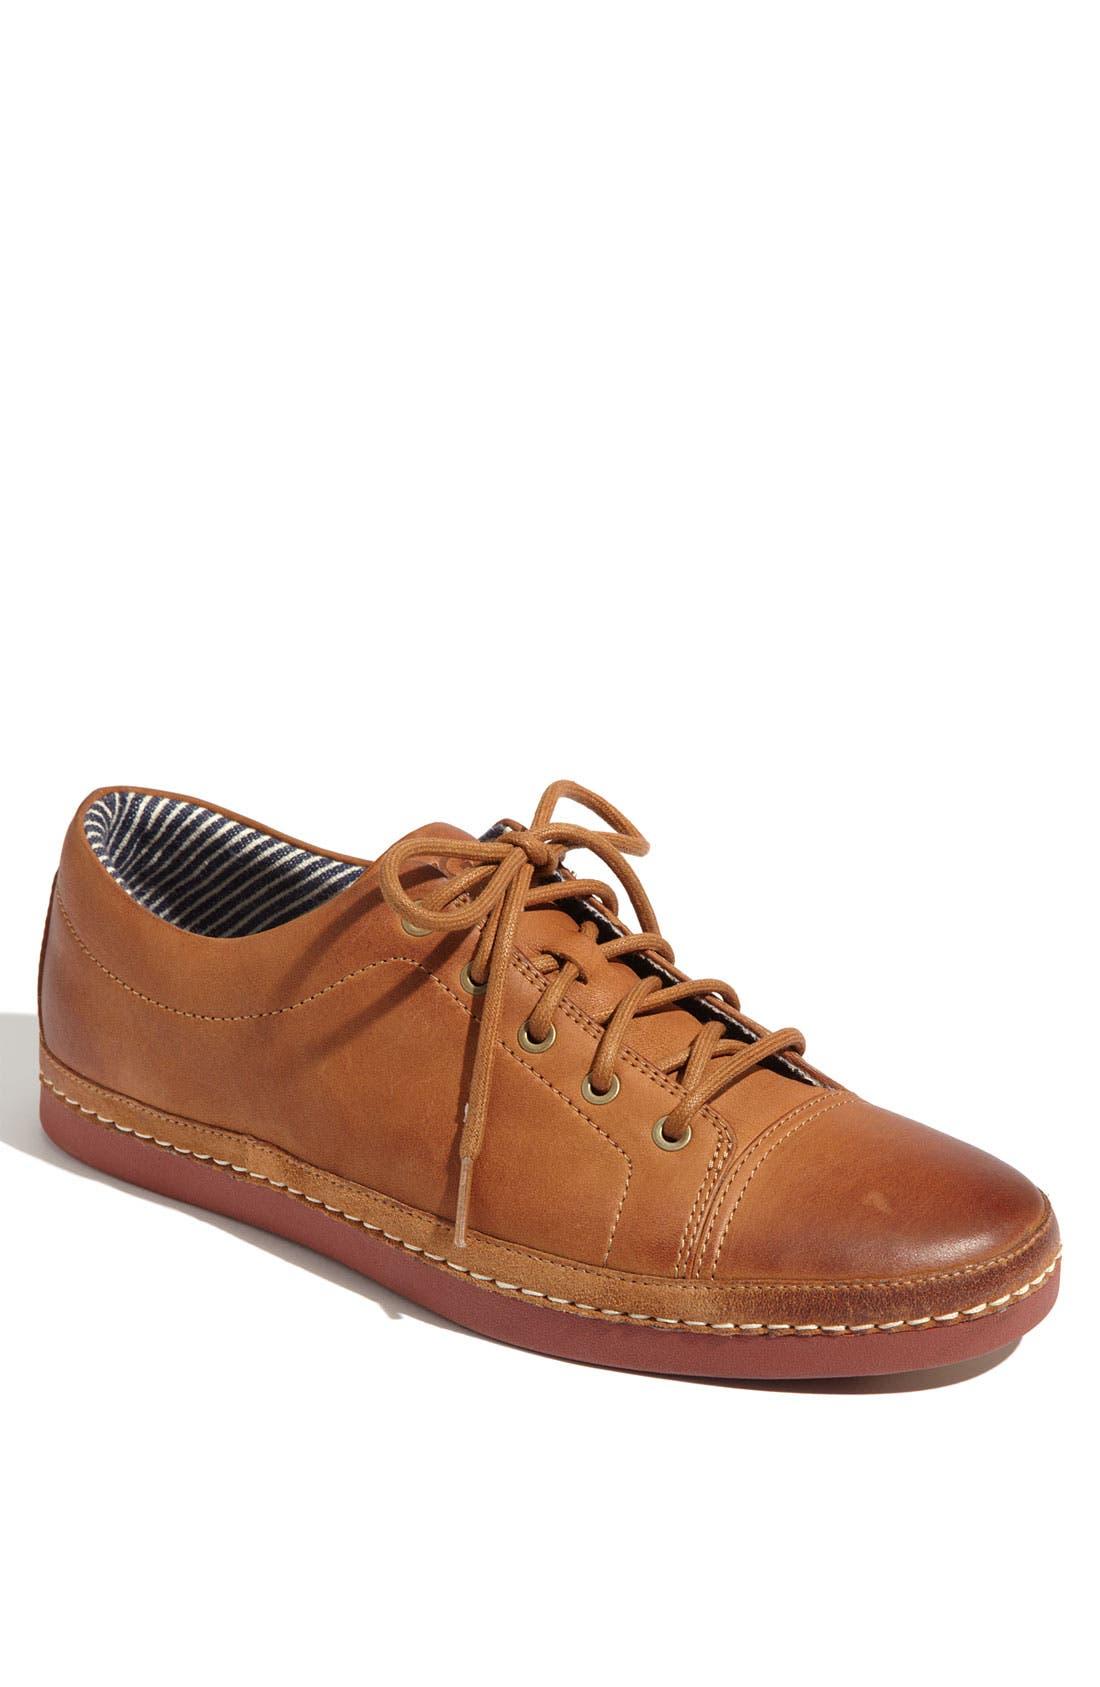 Main Image - UGG® Australia 'Duncan Bay' Leather Sneaker (Men)